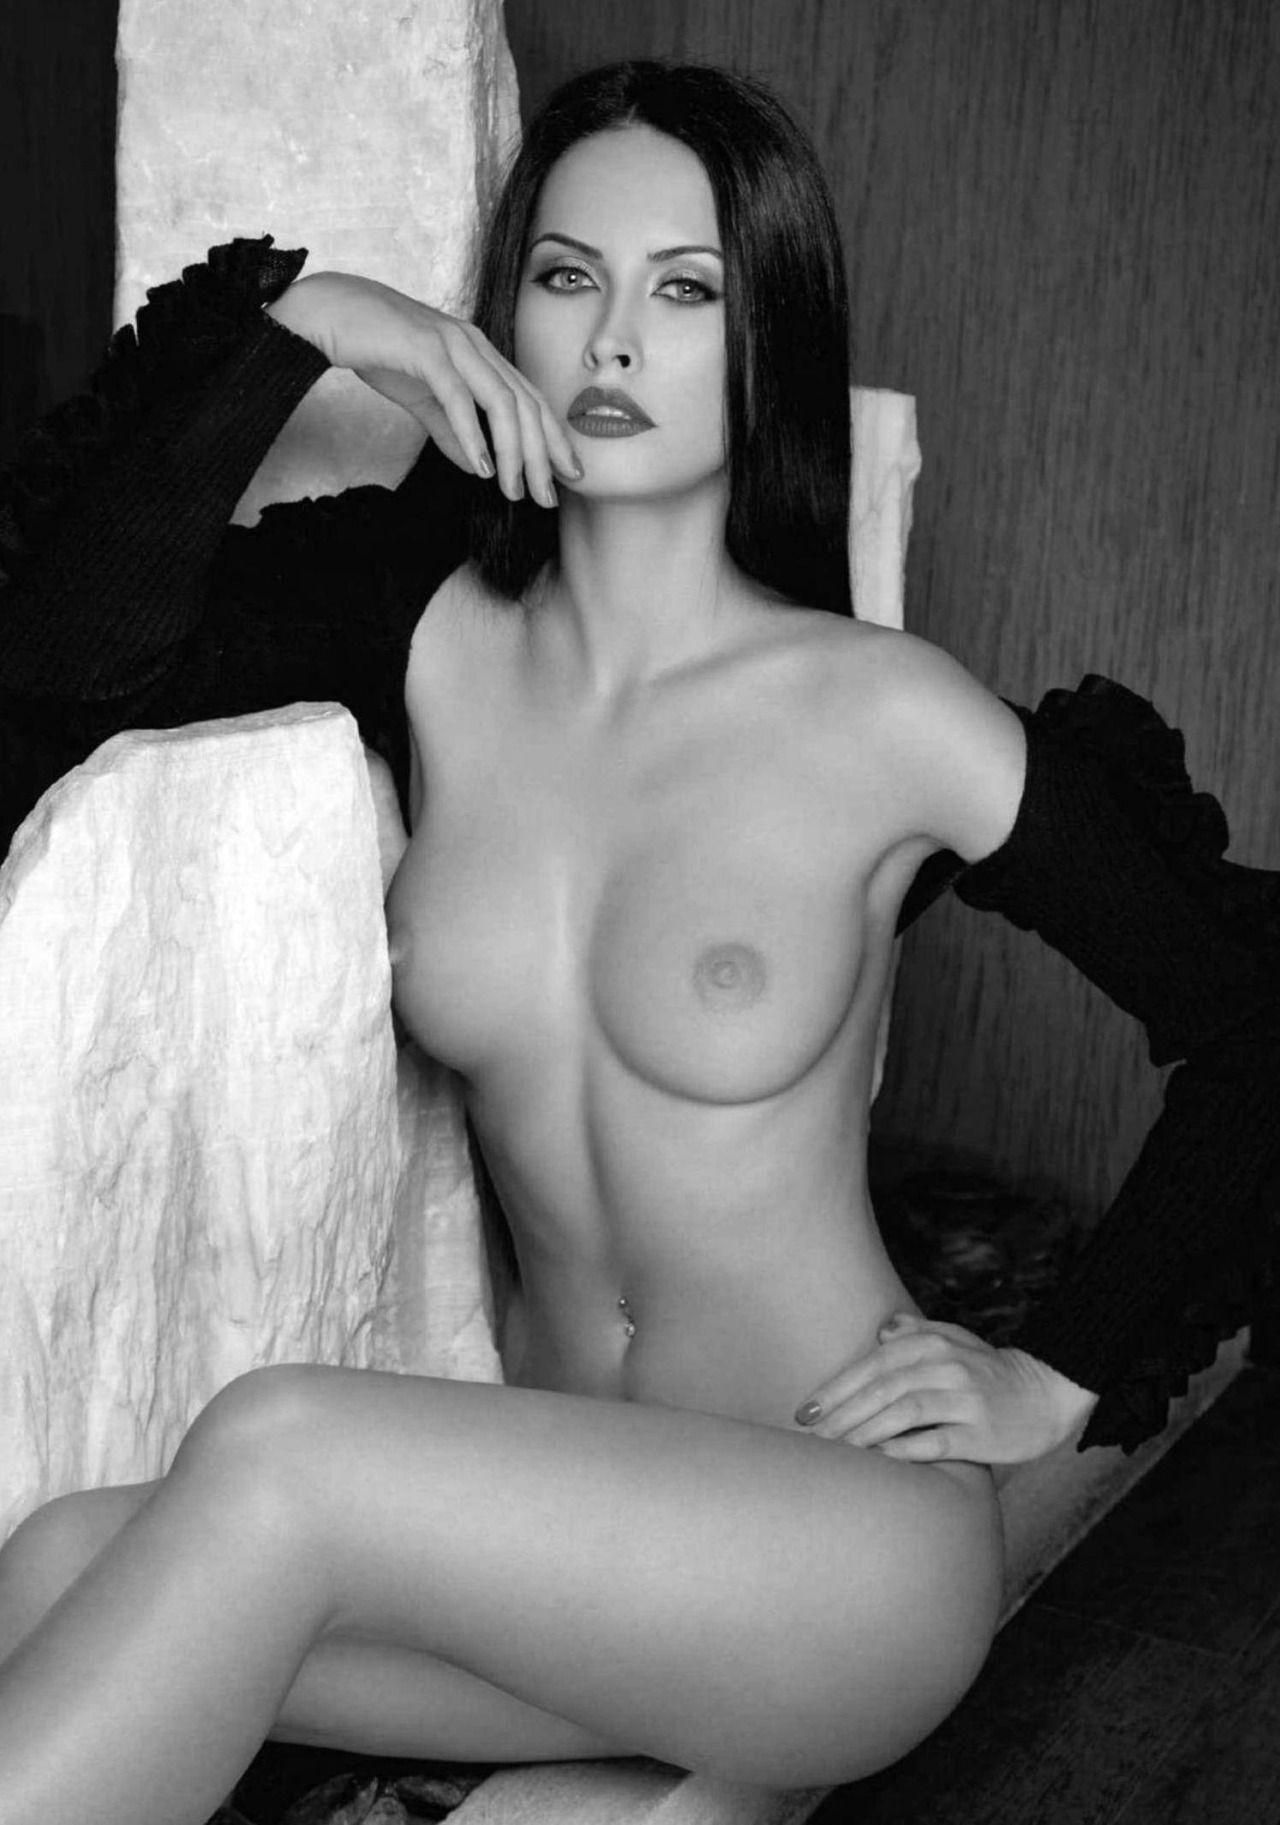 Lily Munster Naked : munster, naked, Munster, XPornpicx